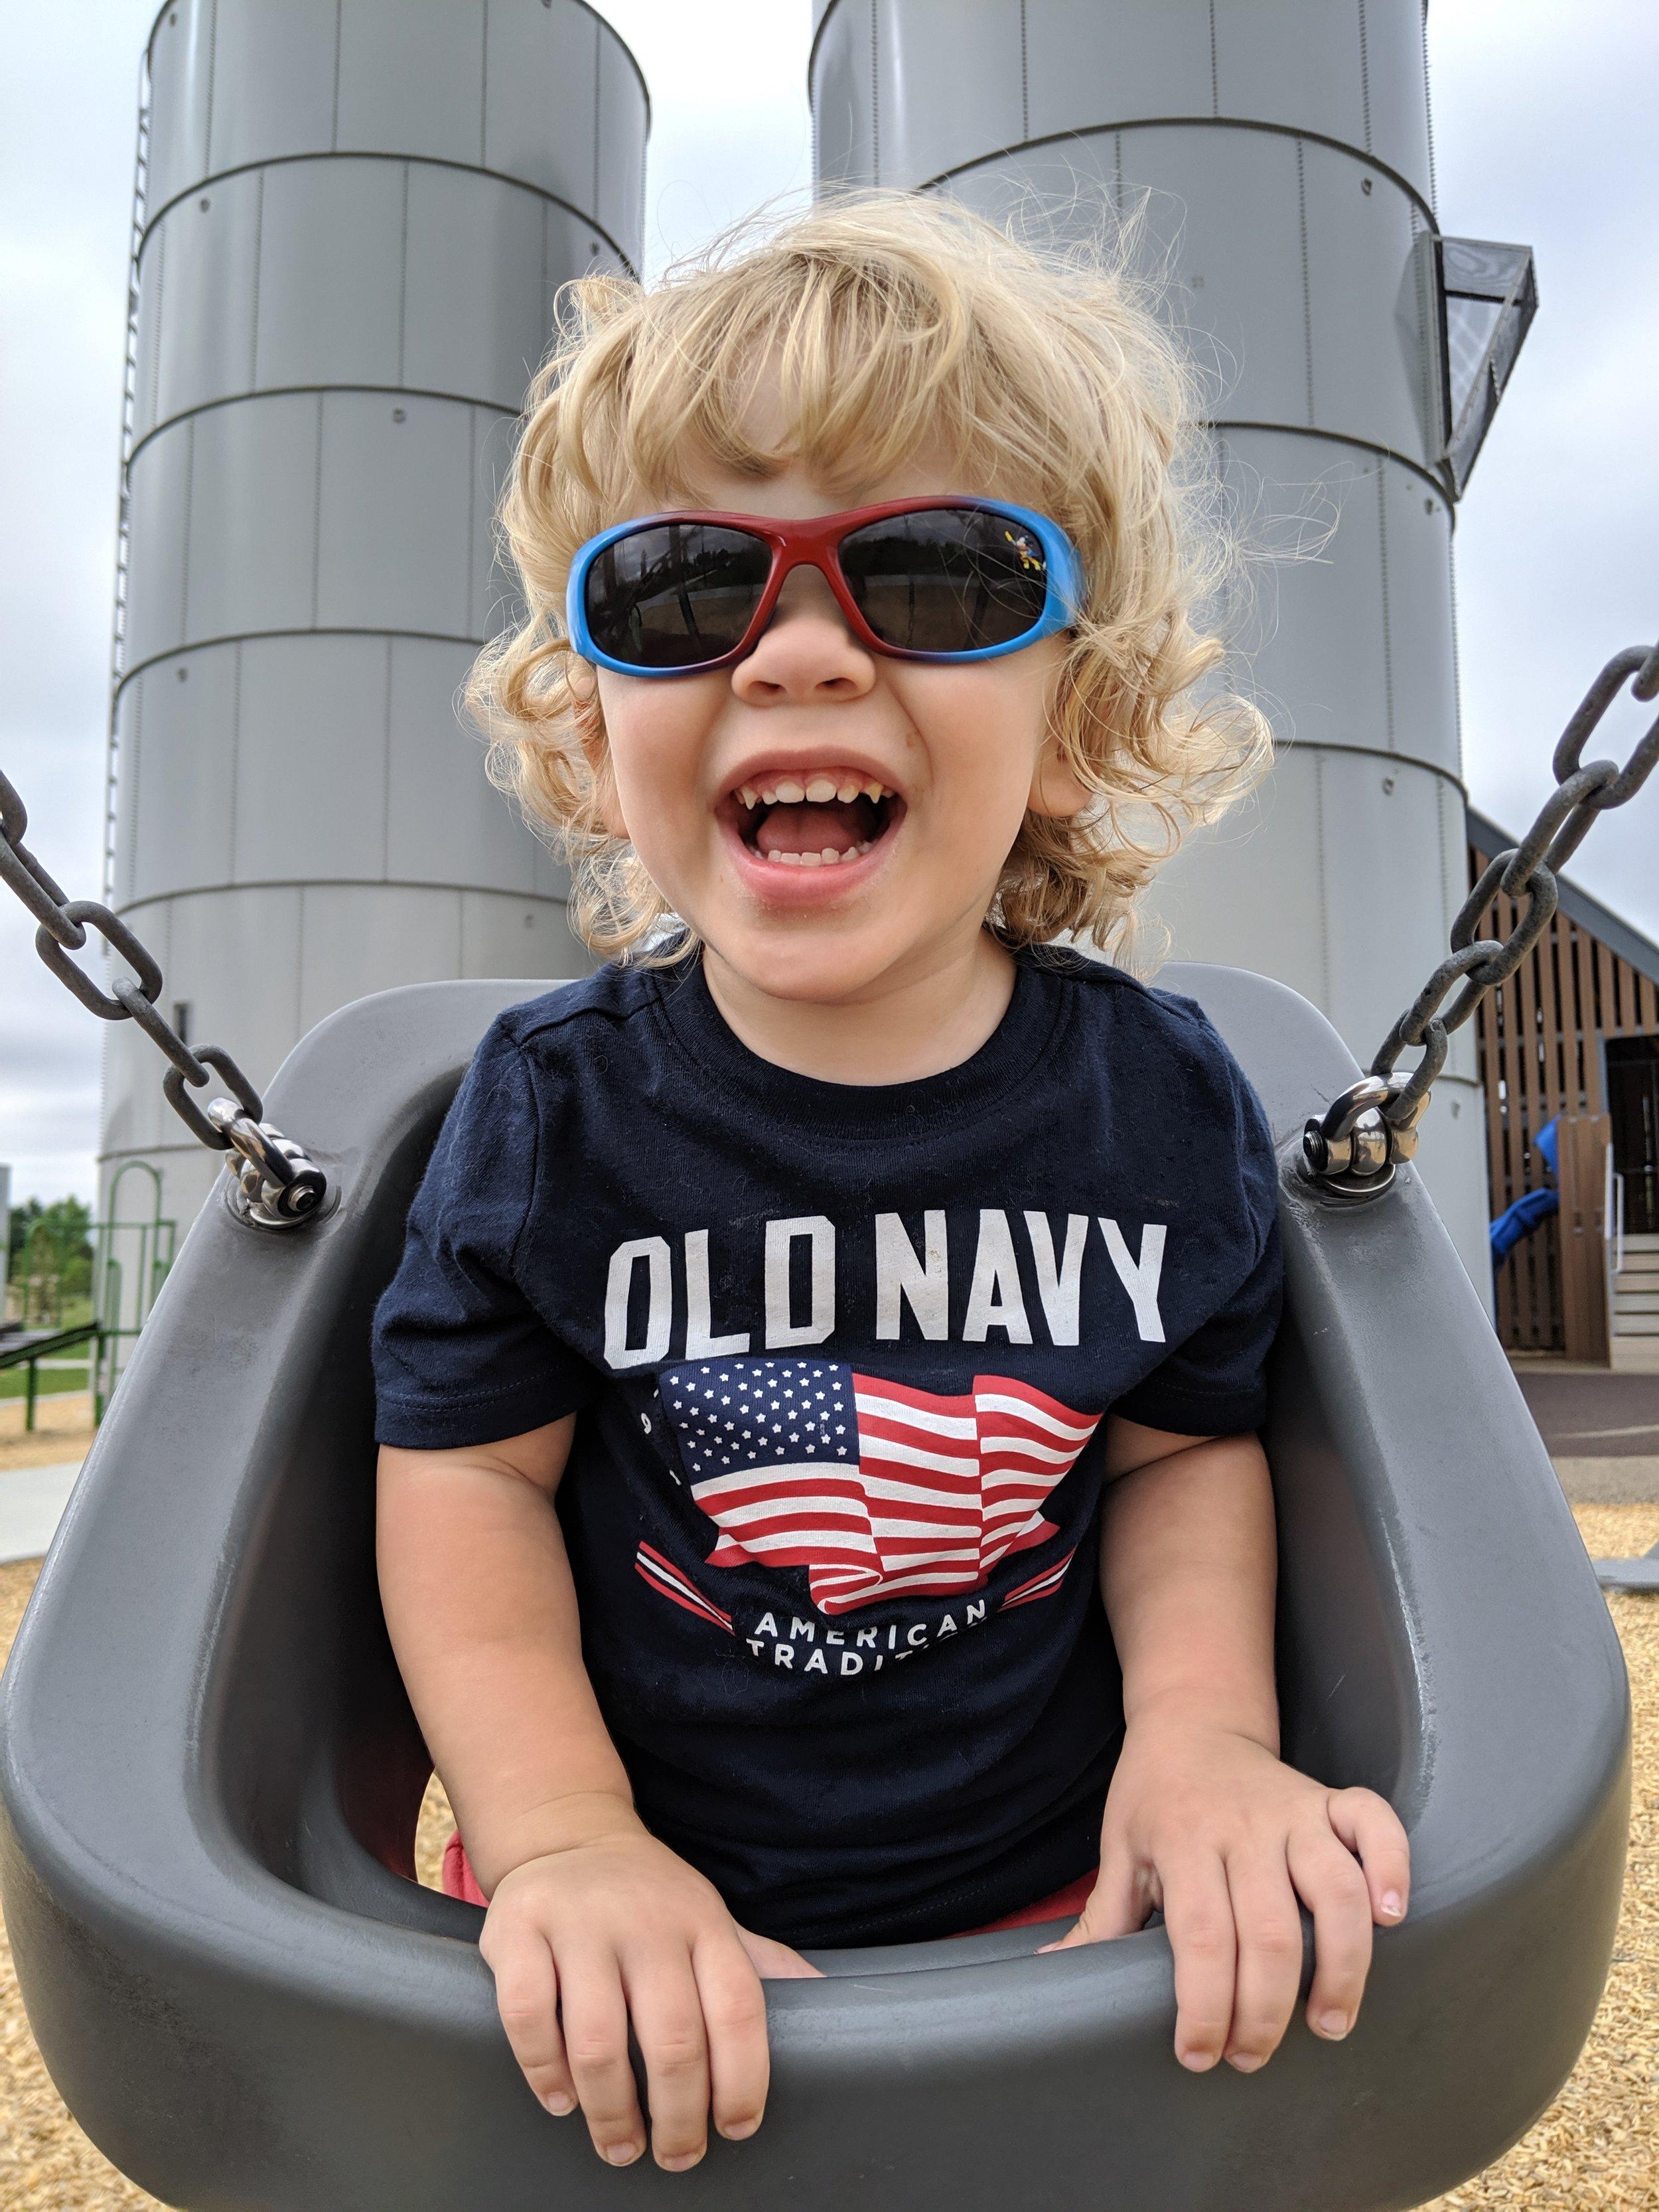 Gus swinging at our favorite park.